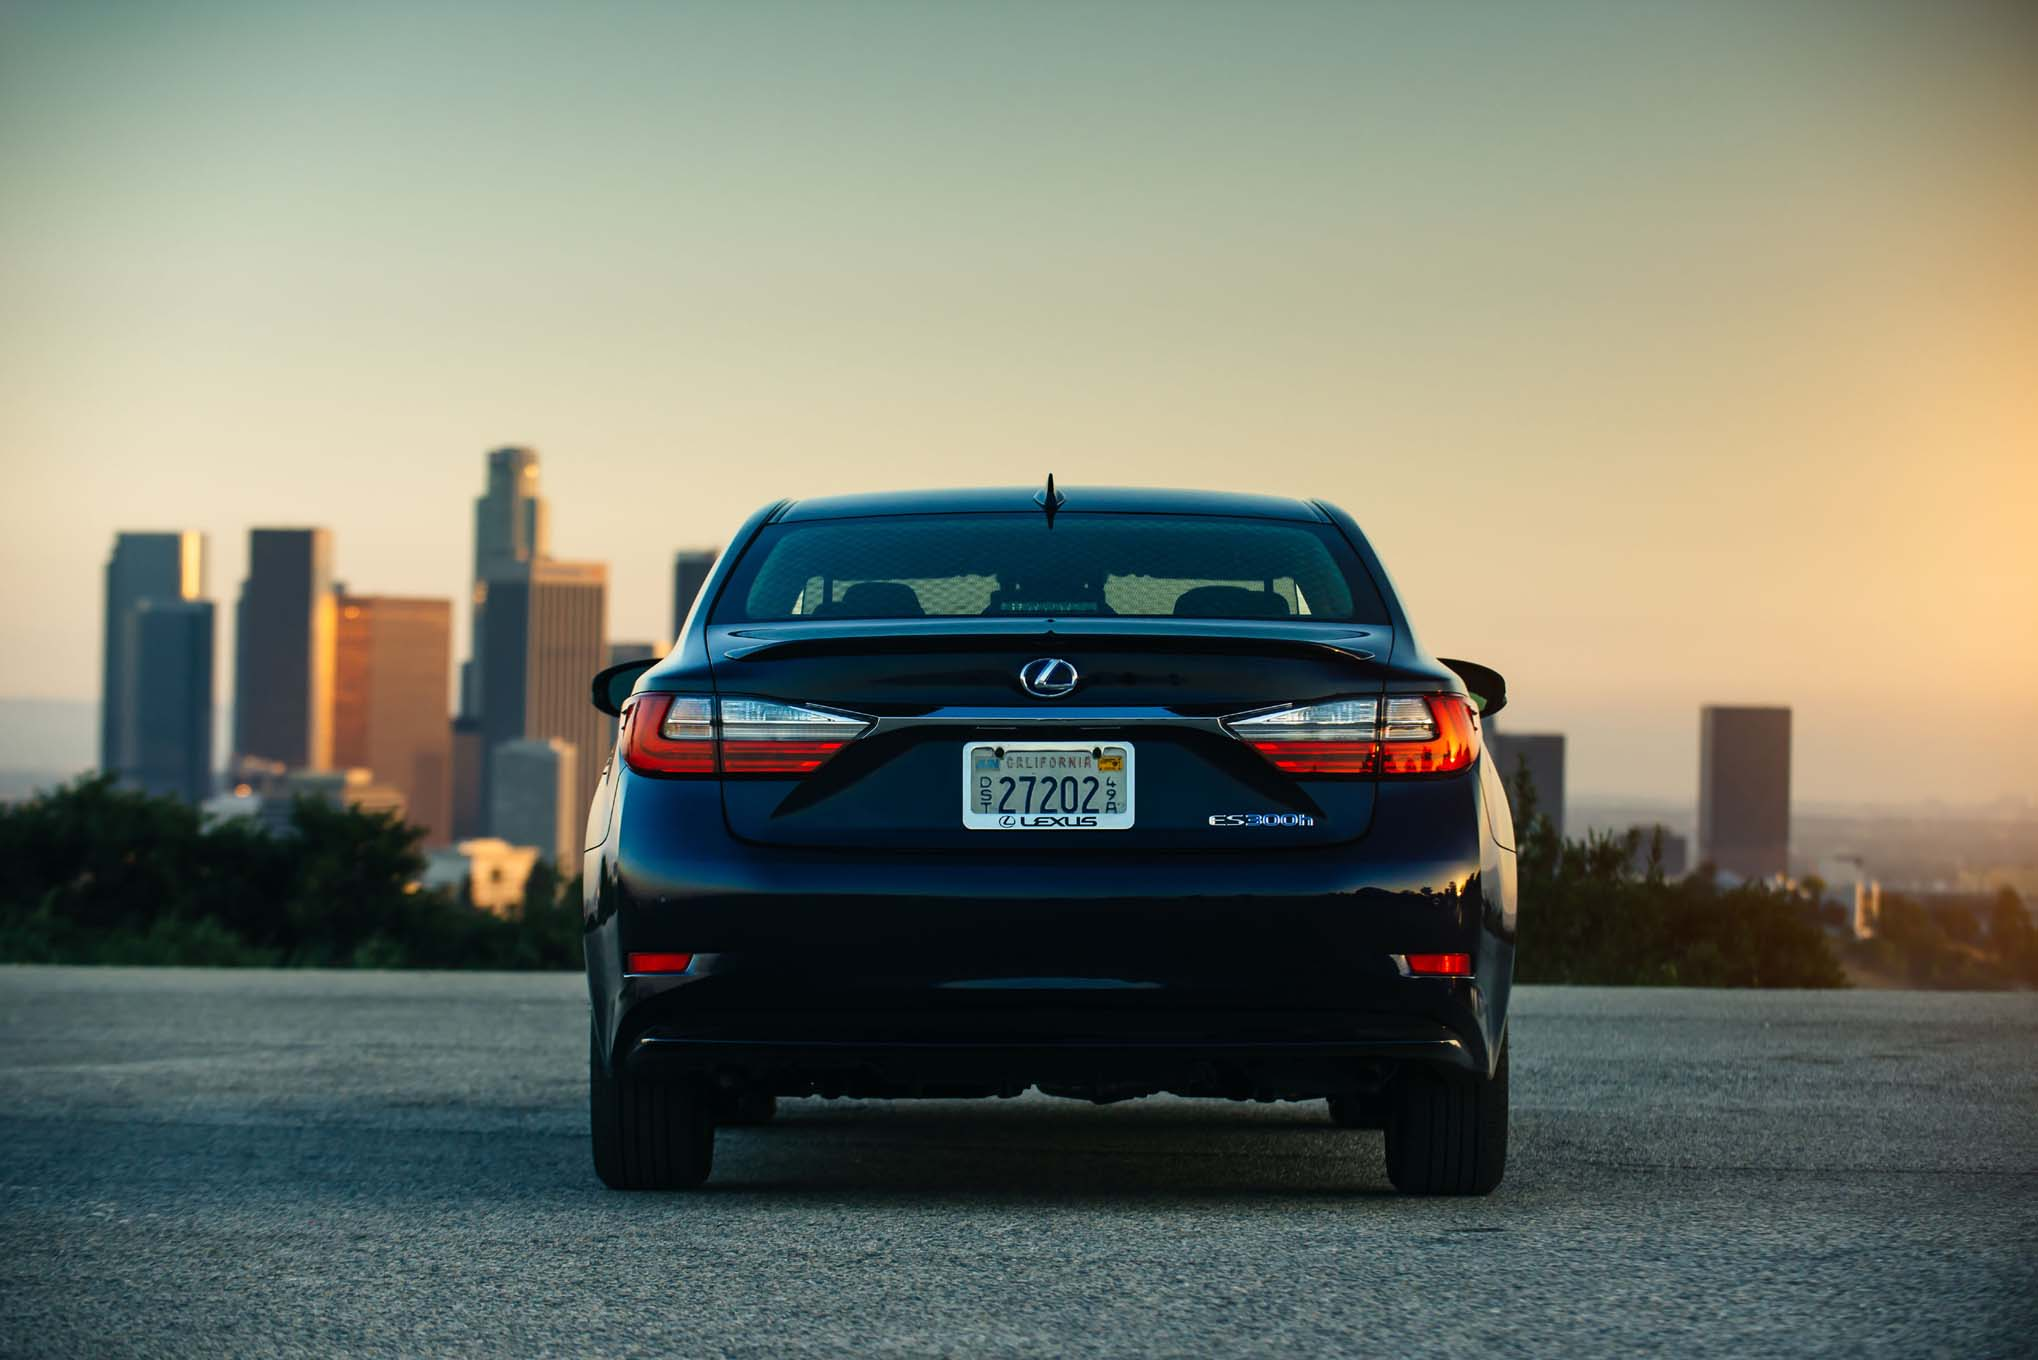 2017-Lexus-ES-300h-rear-end-